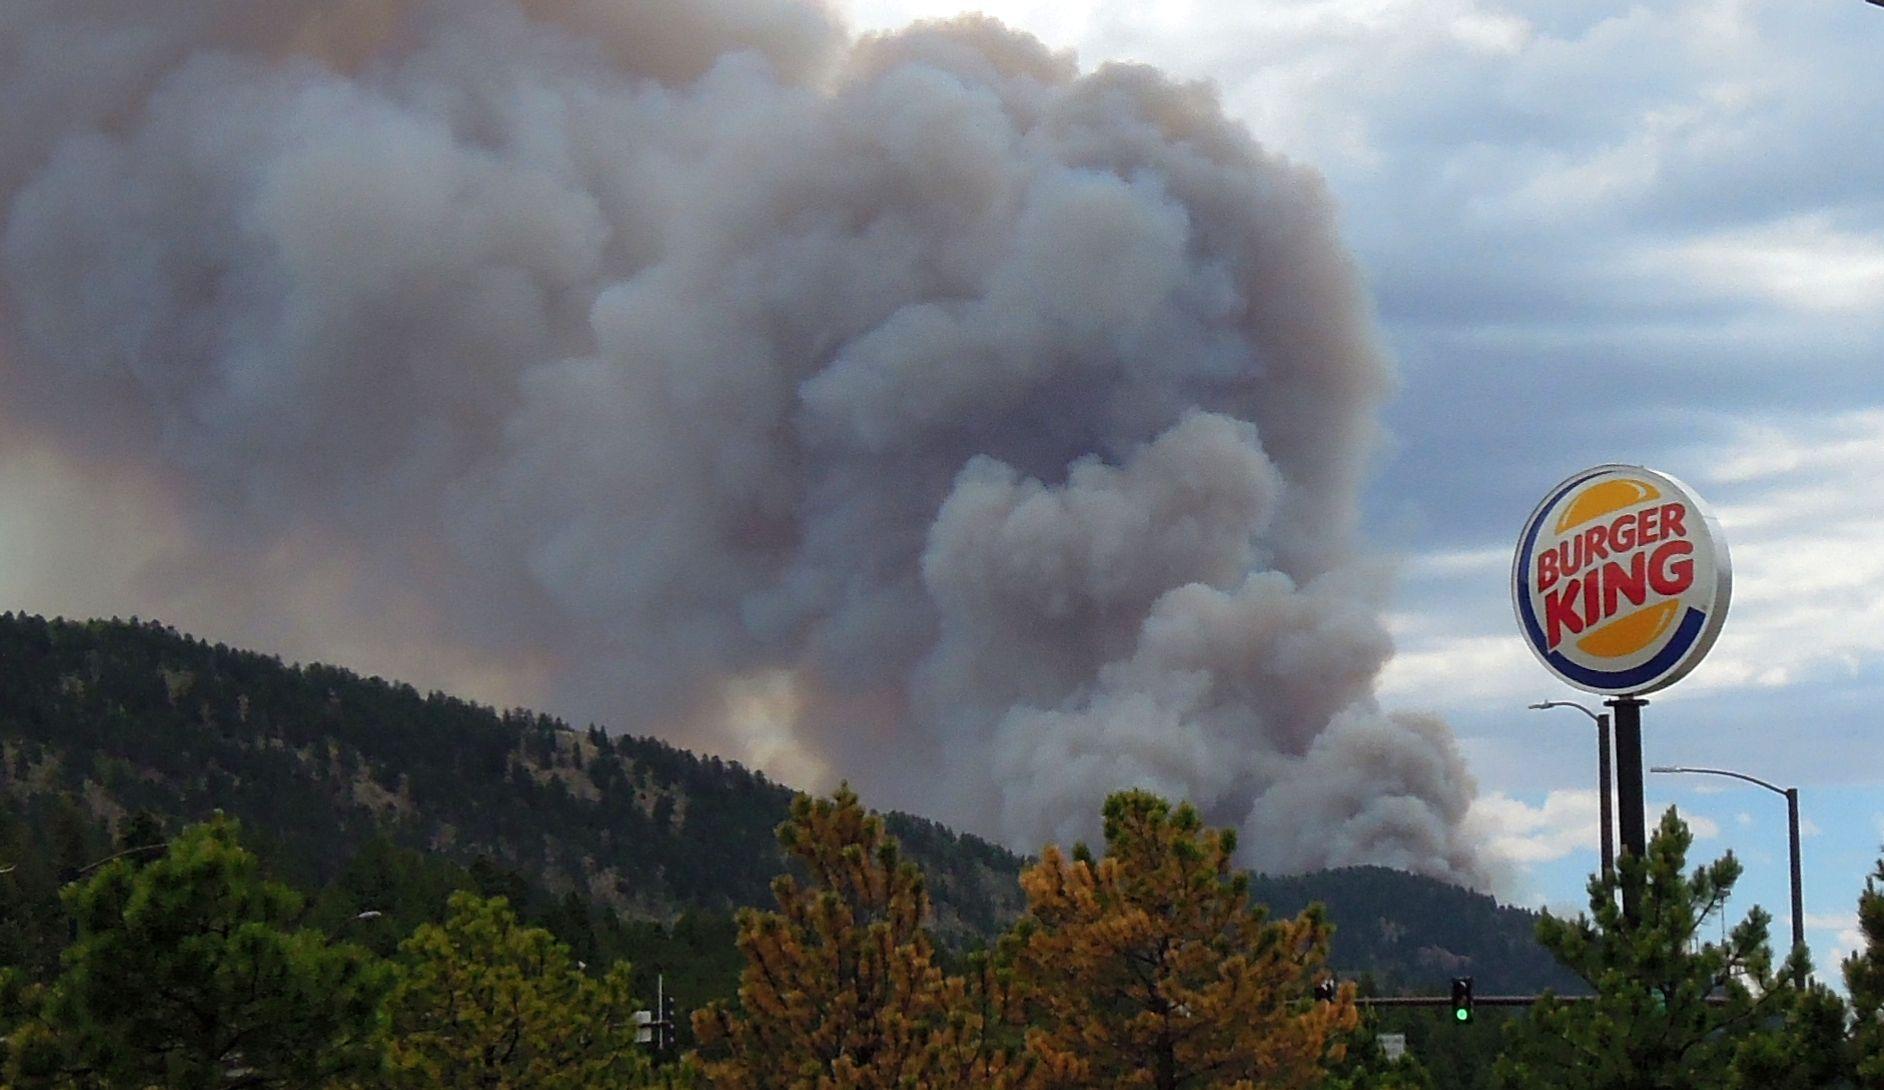 Waldo Canyon fire from SafeWay ParkingLot